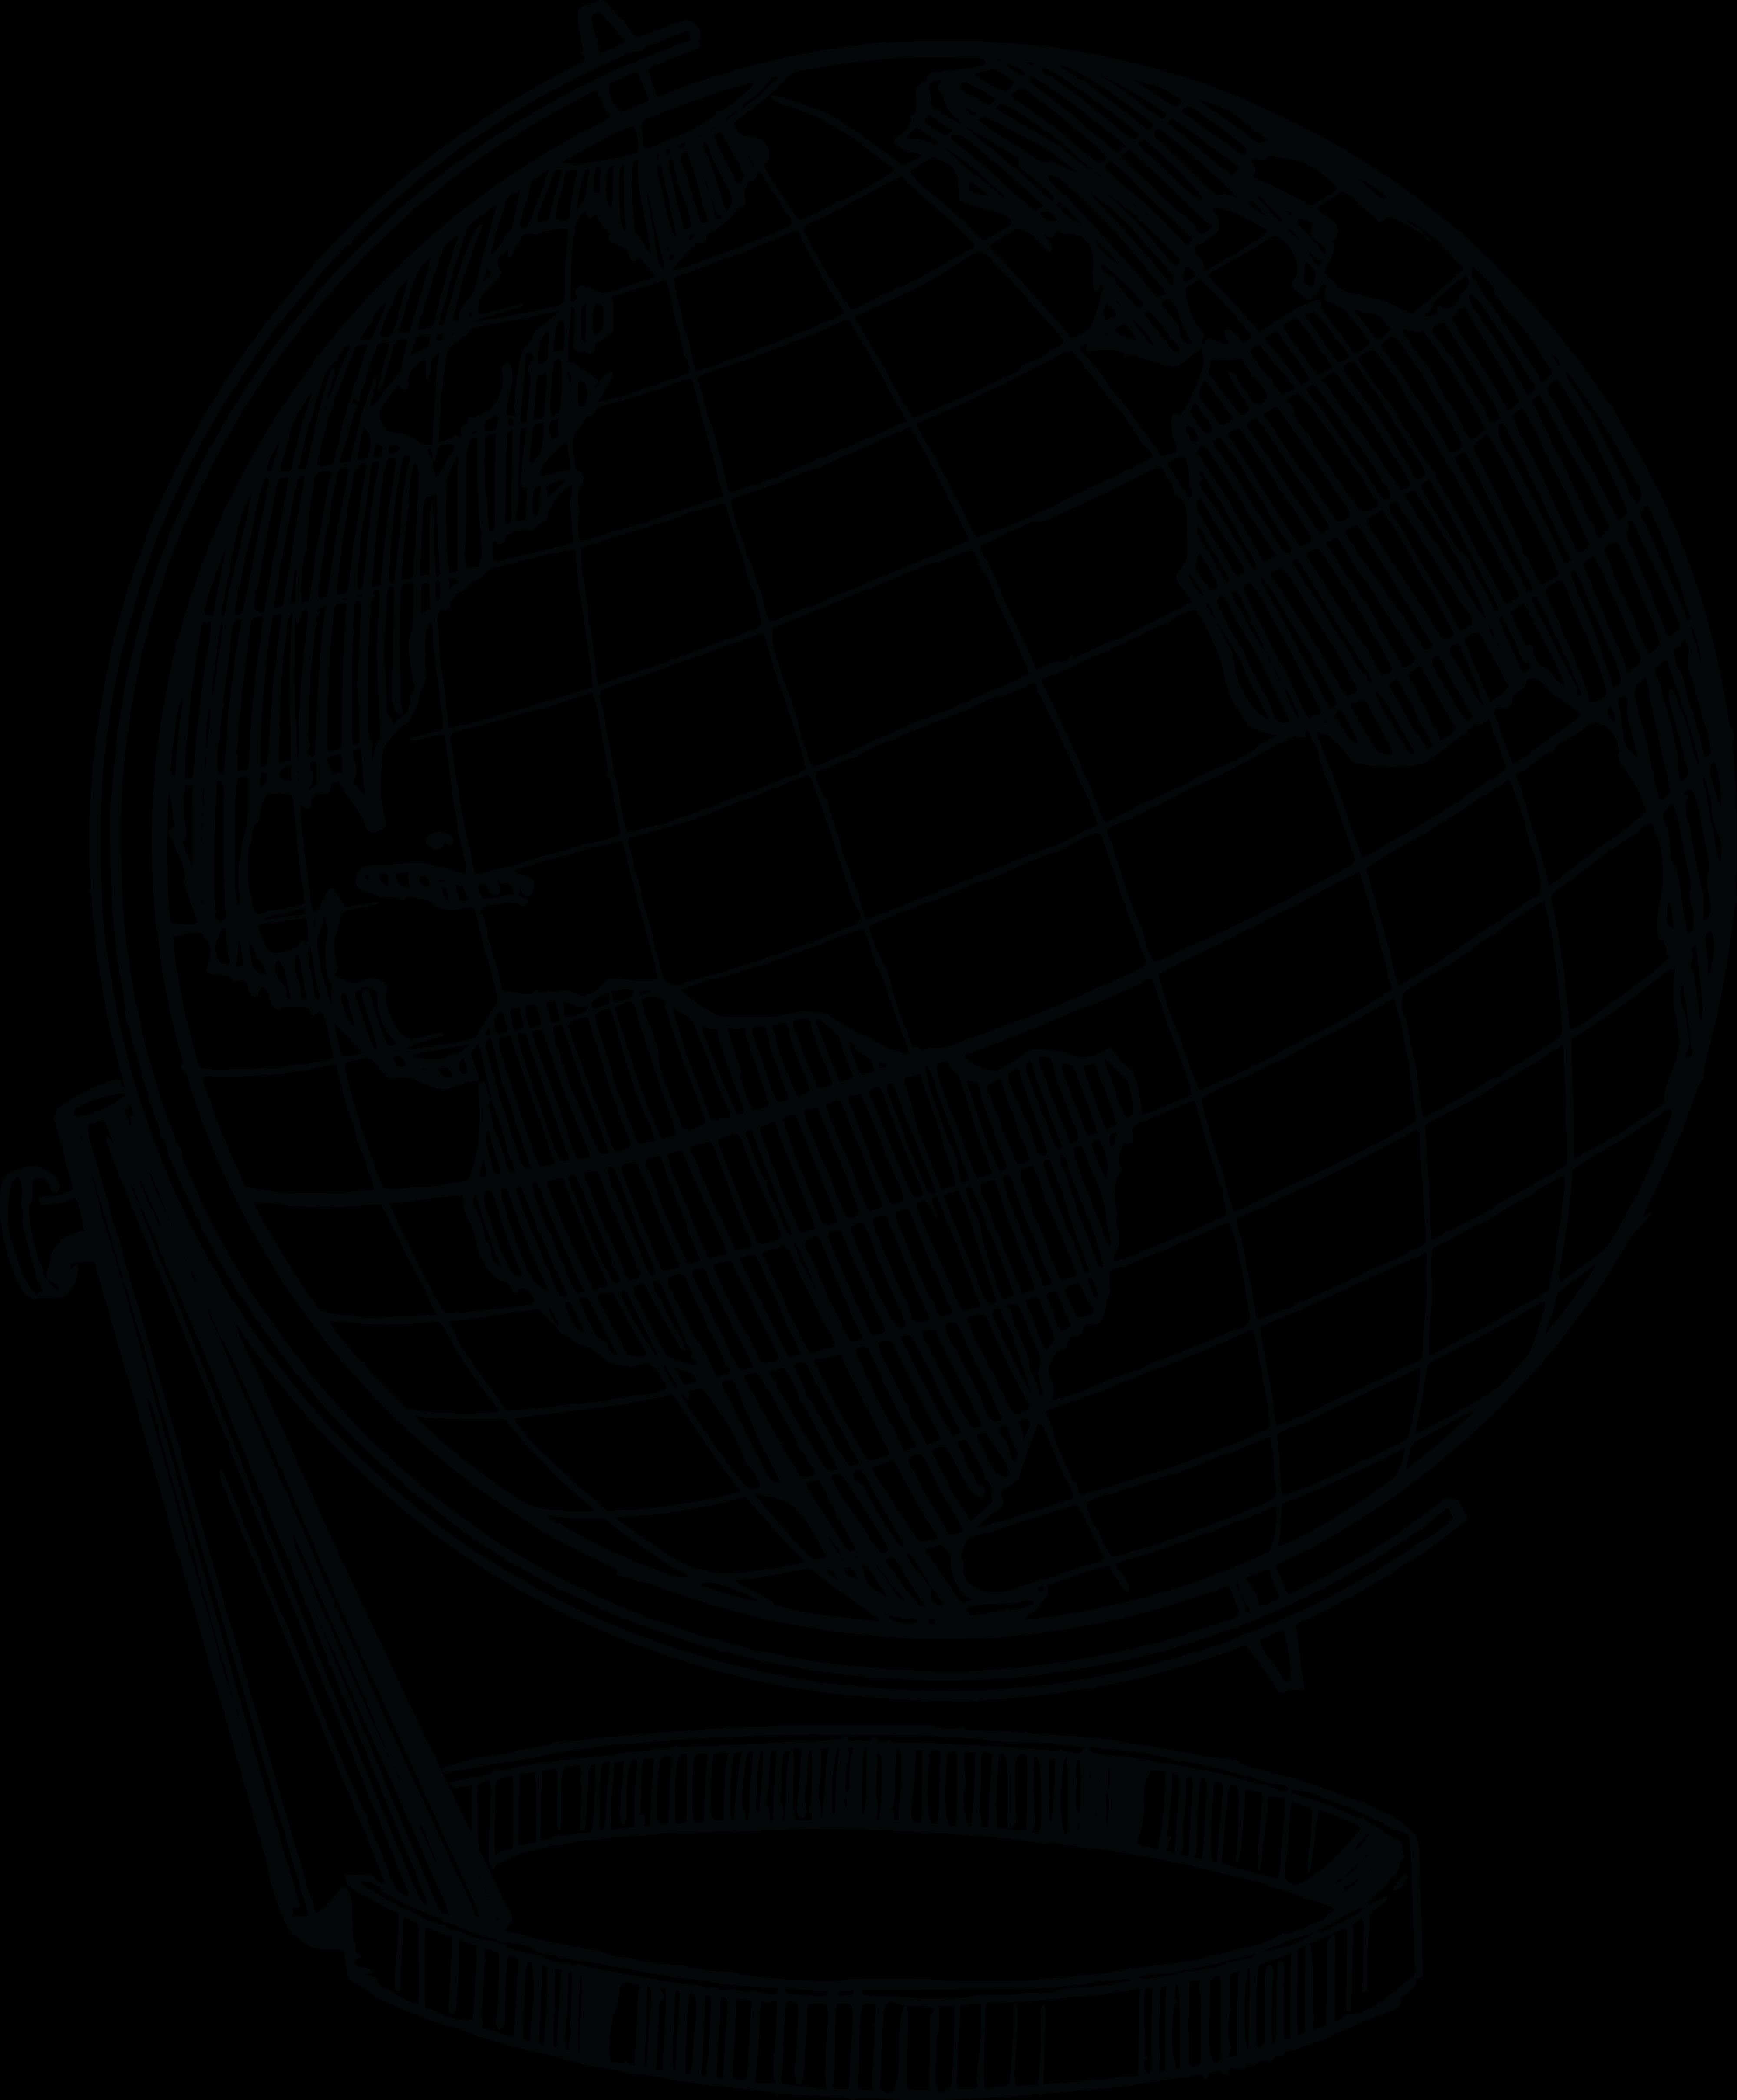 Line Art Globe : Free clipart of a desk globe